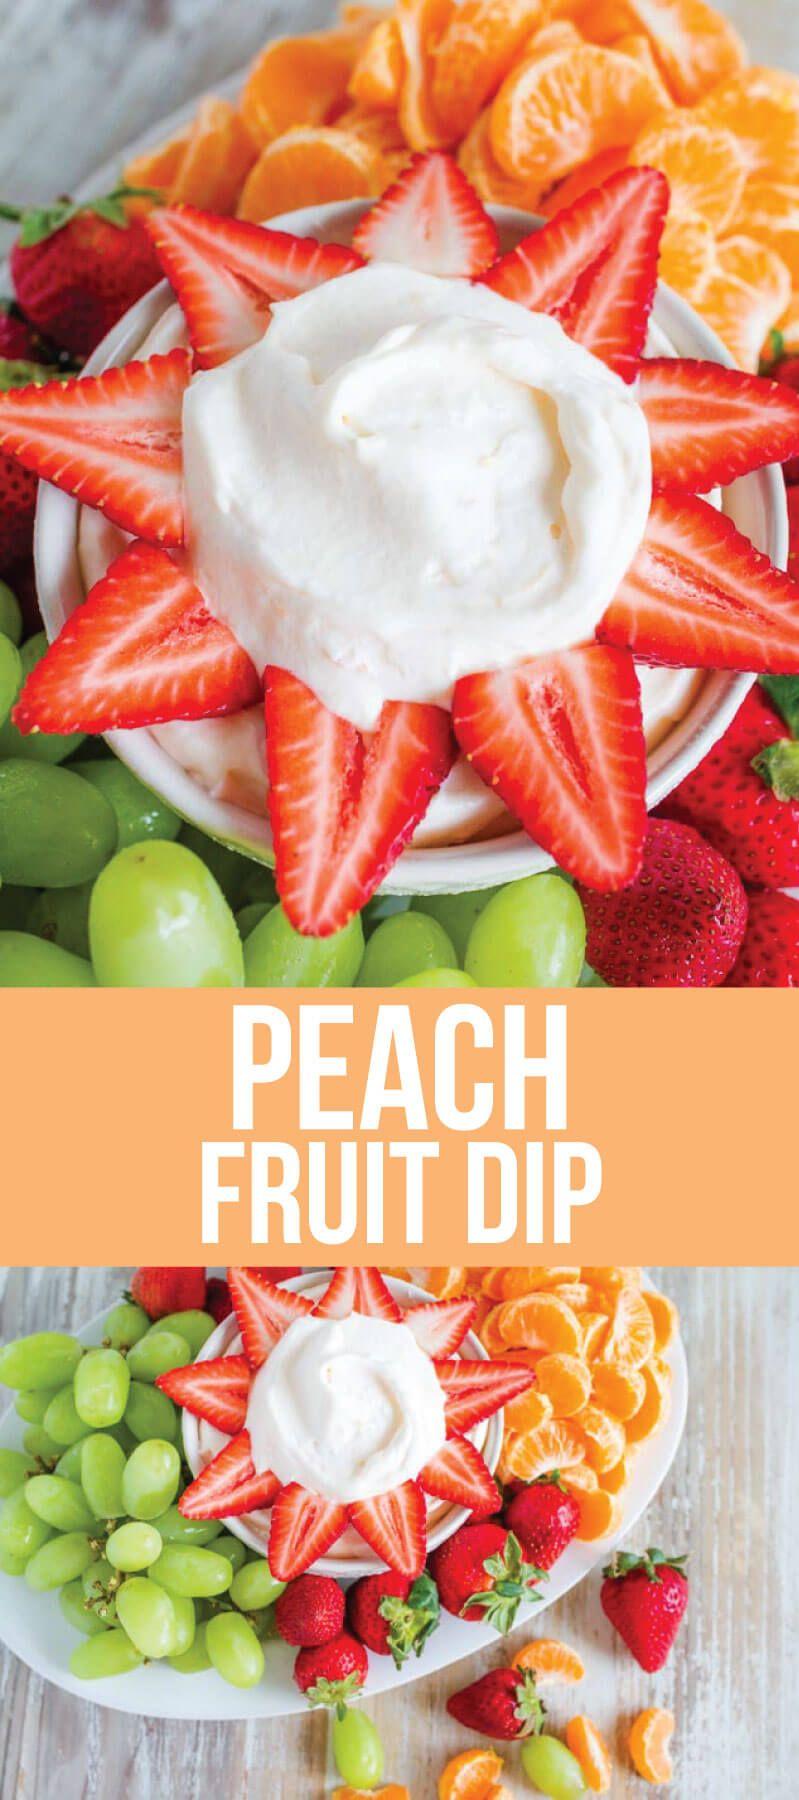 Peach Yogurt Fruit Dip Recipe From 30daysblog Fruit Dips Recipes Fruit Salad Ideas Parties Fruit Dip